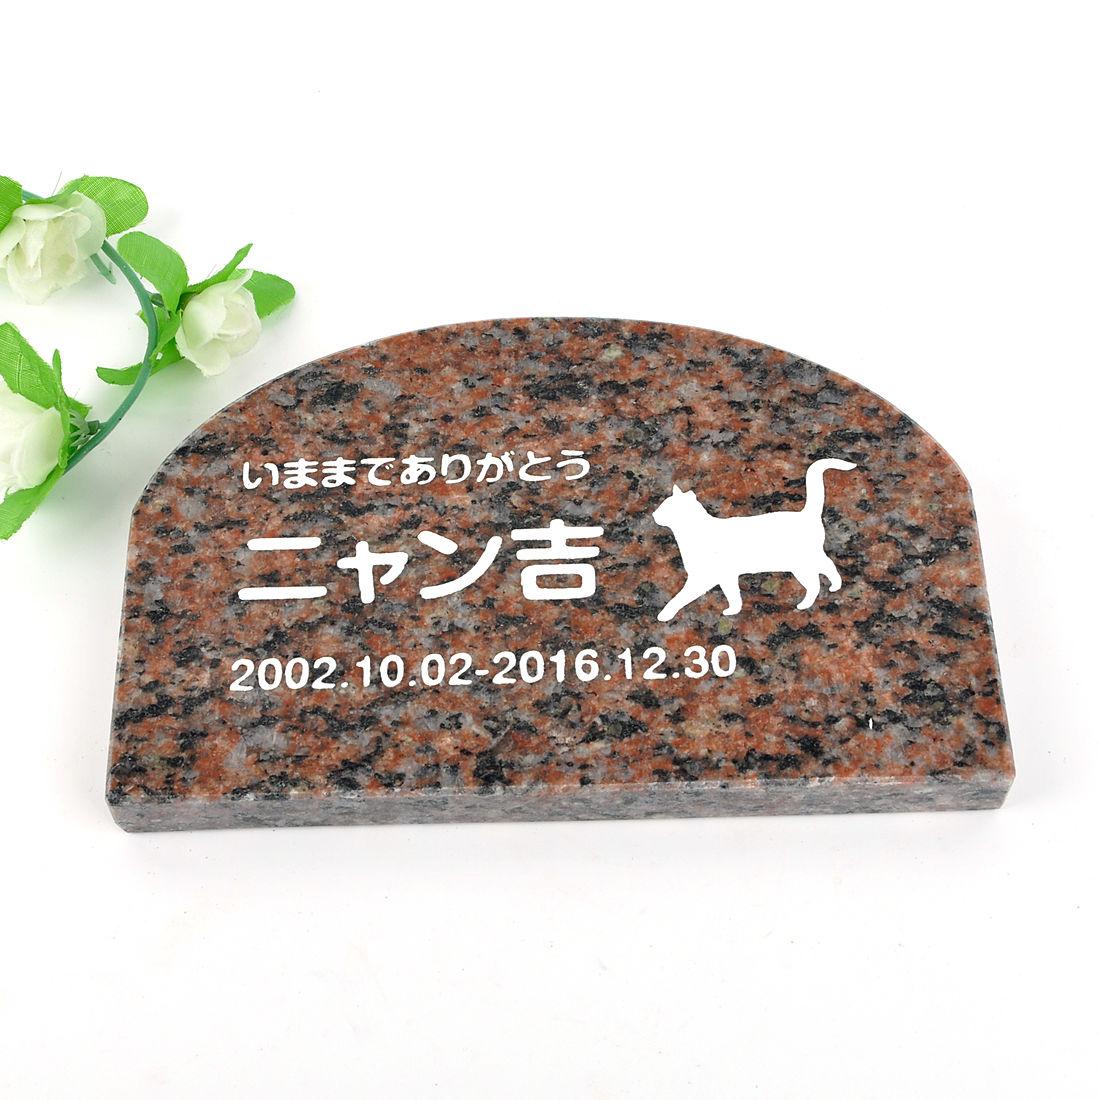 Pet&Love. ペットのお墓 天然石製 シンプル型 御影石 レッド アーチ 200x130mm(厚さ20mm)  【HLS_DU】【楽ギフ_名入れ】 attr130attr ctgr2ctgr sml3sml+ctgr2ctgr CAT